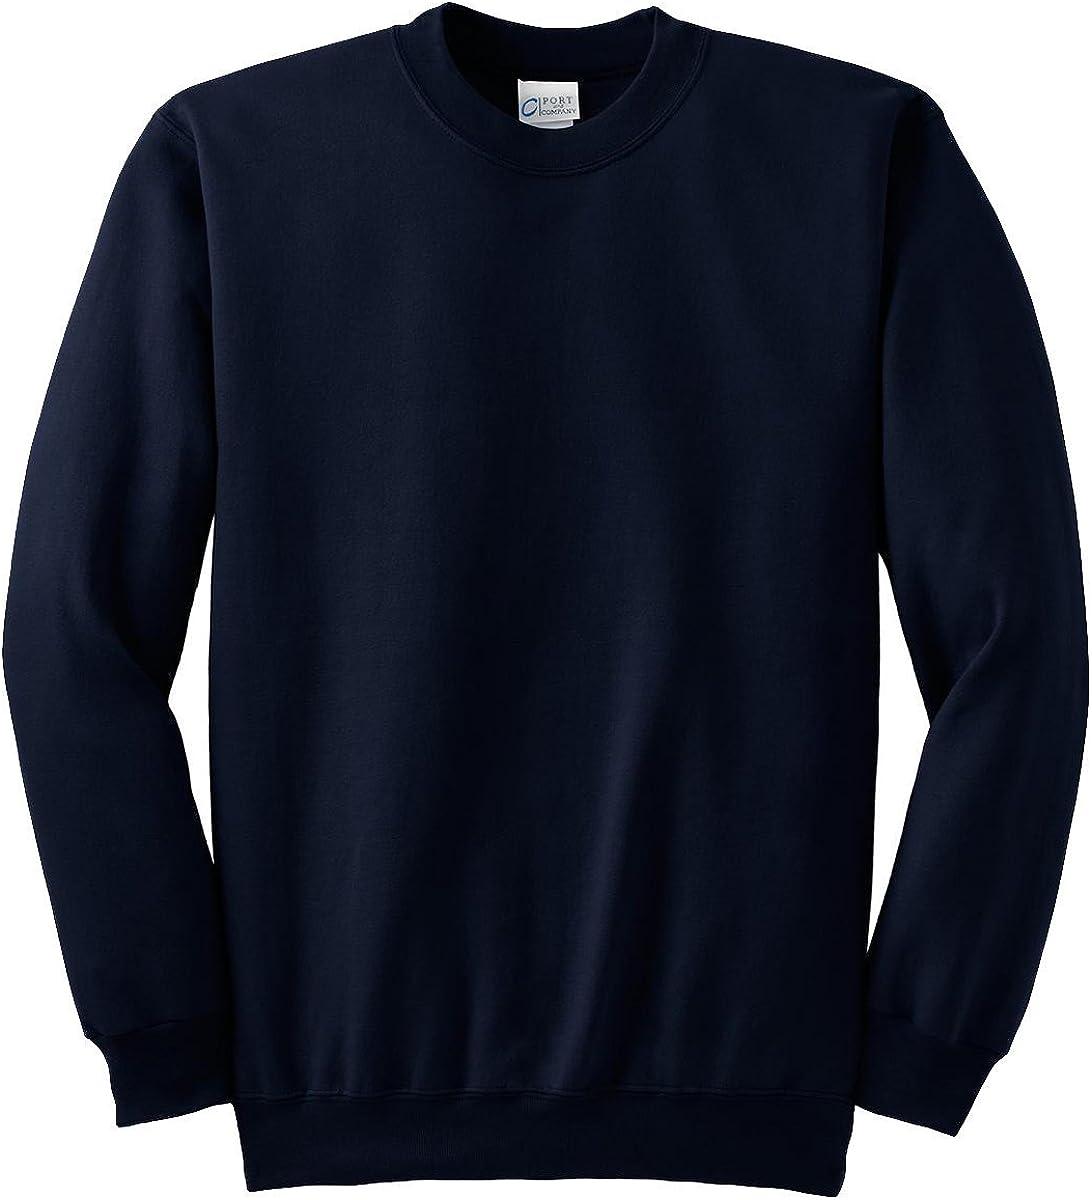 Port & Company Tall Essential Fleece Crewneck Sweatshirt. PC90T, Navy, 4XLT